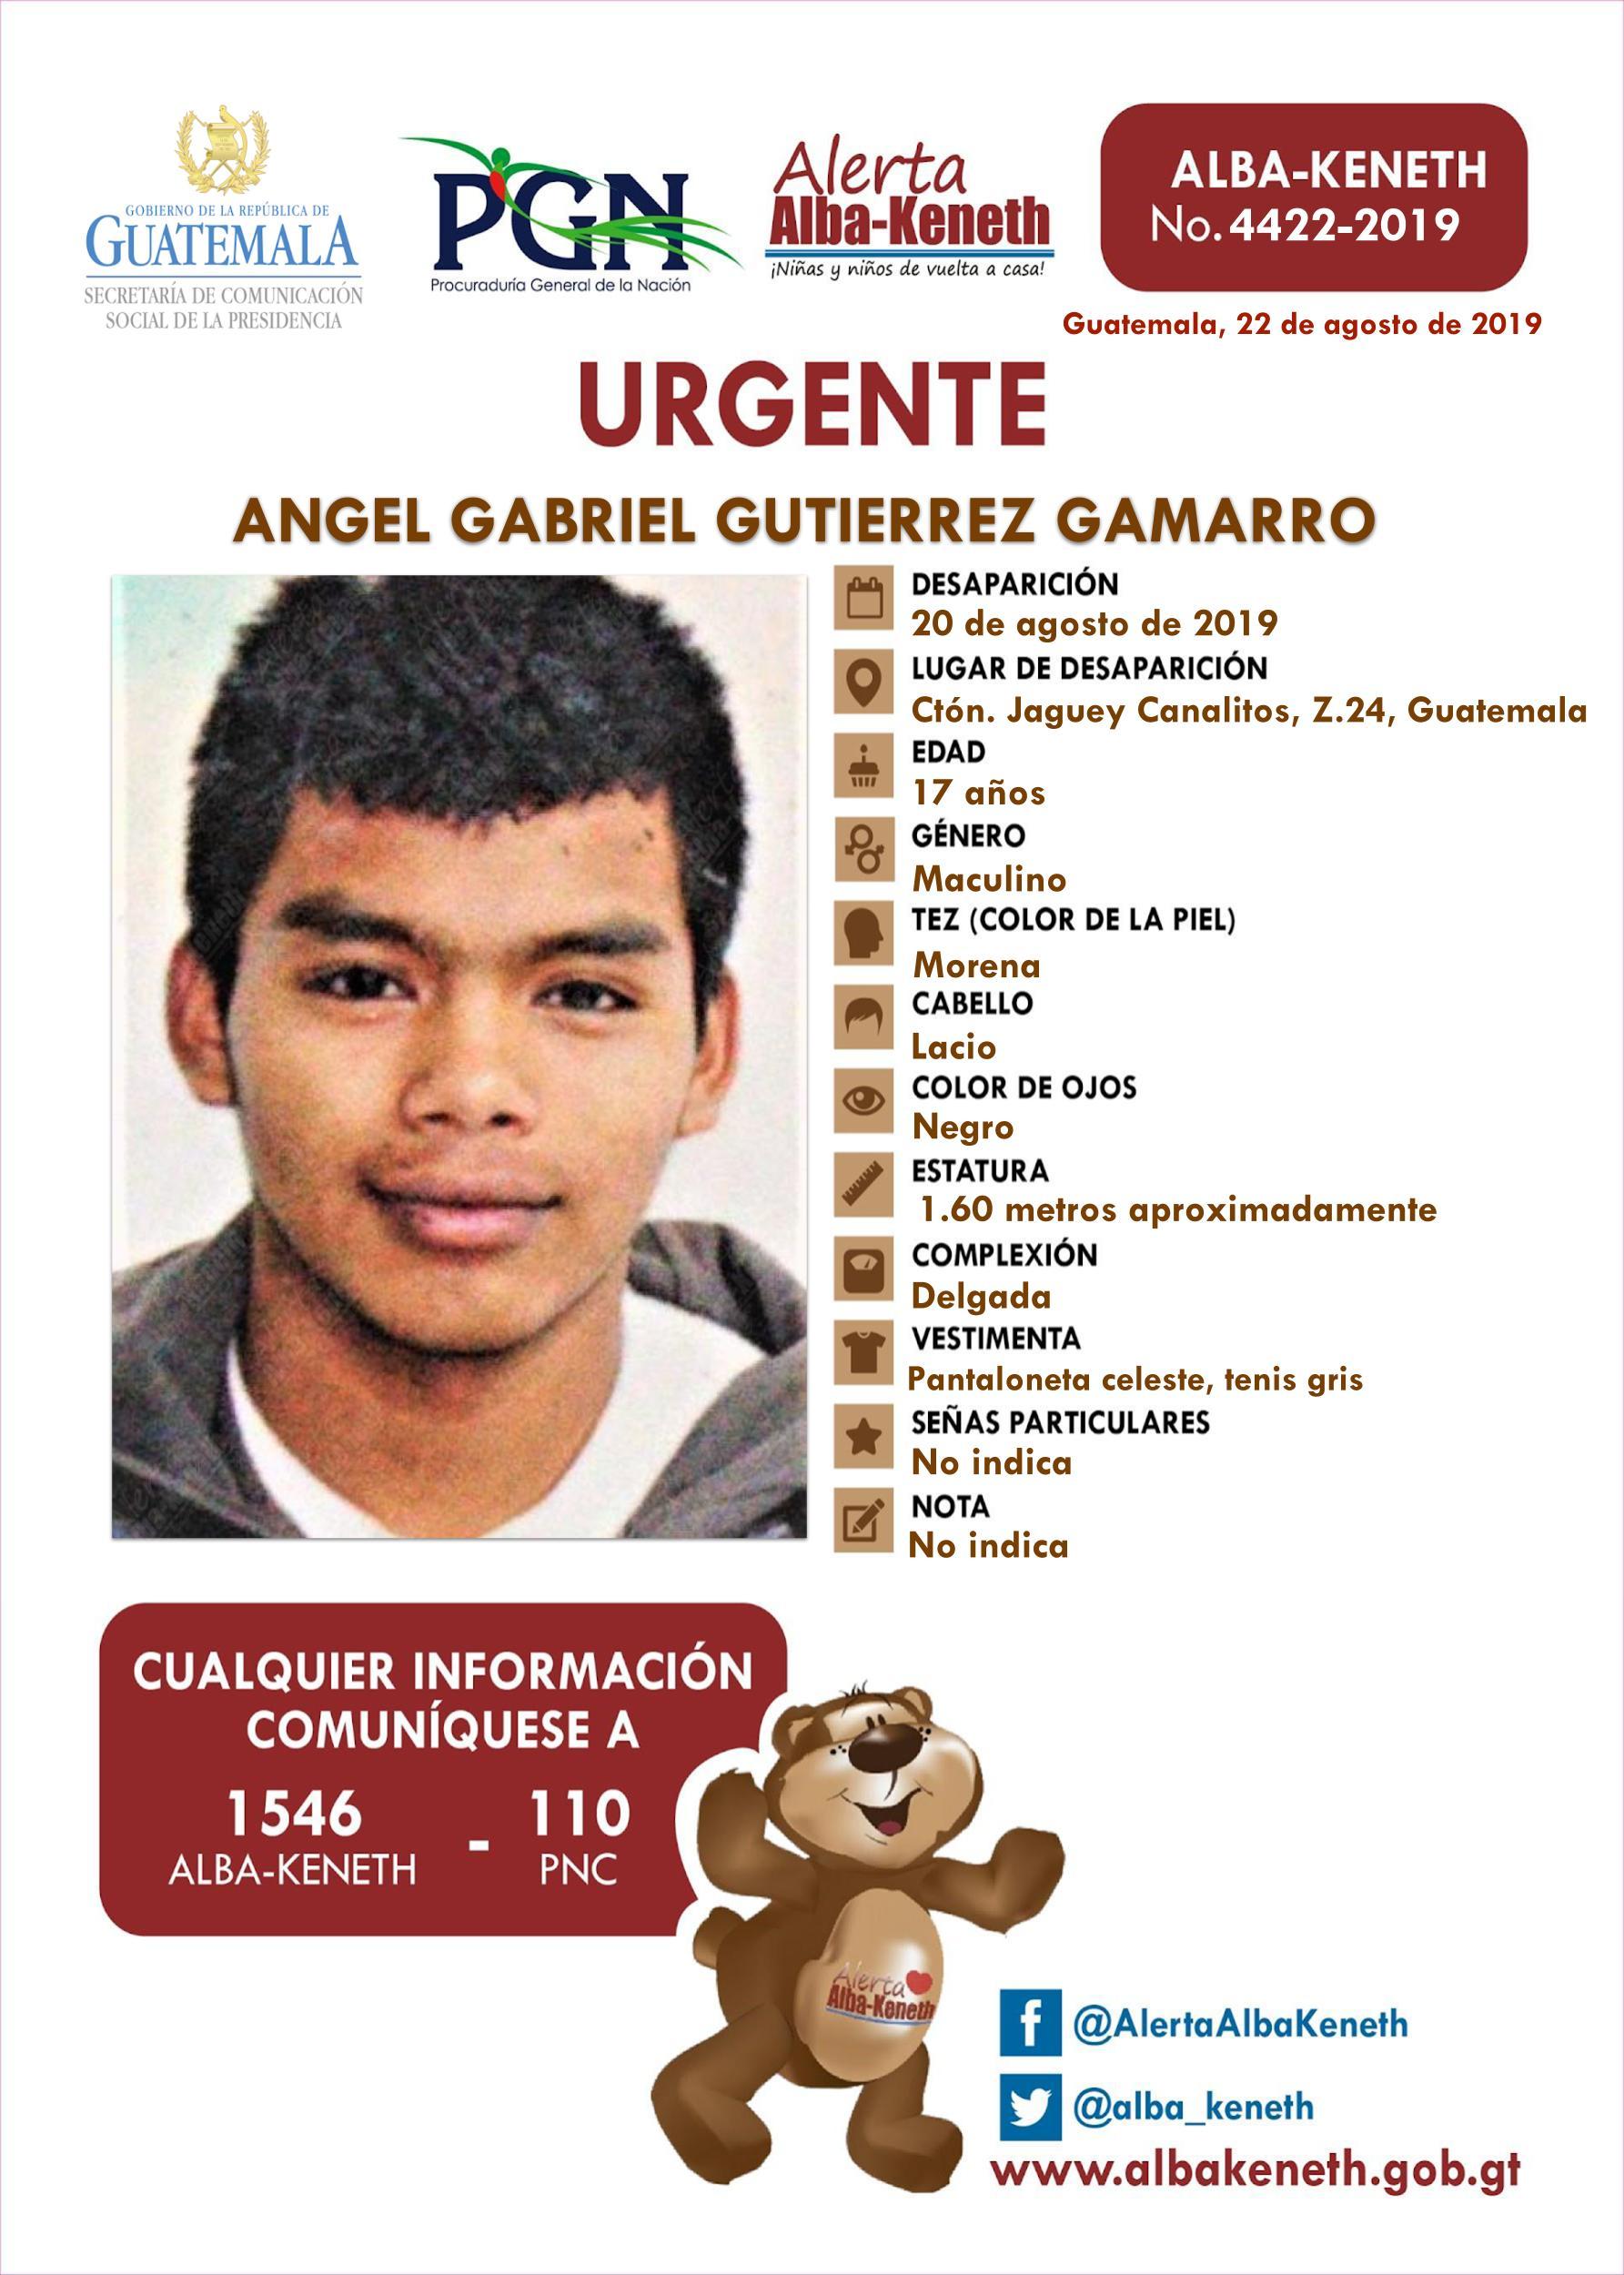 Angel Gabriel Gutierrez Gamarro